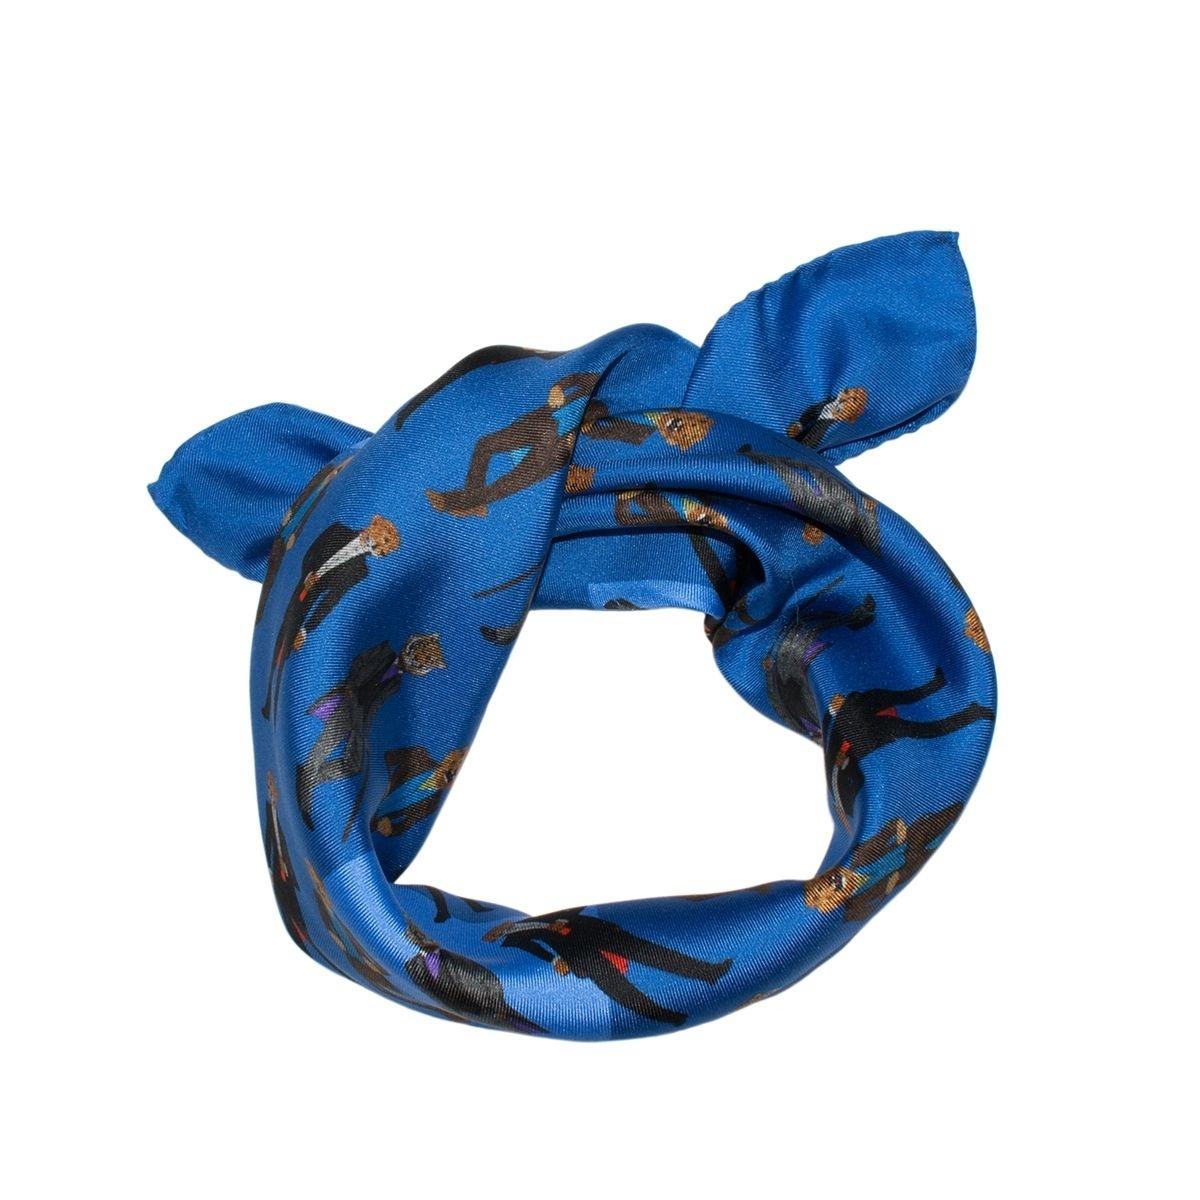 Foulard en soie enfant mini carré bleu garçon DANDYS